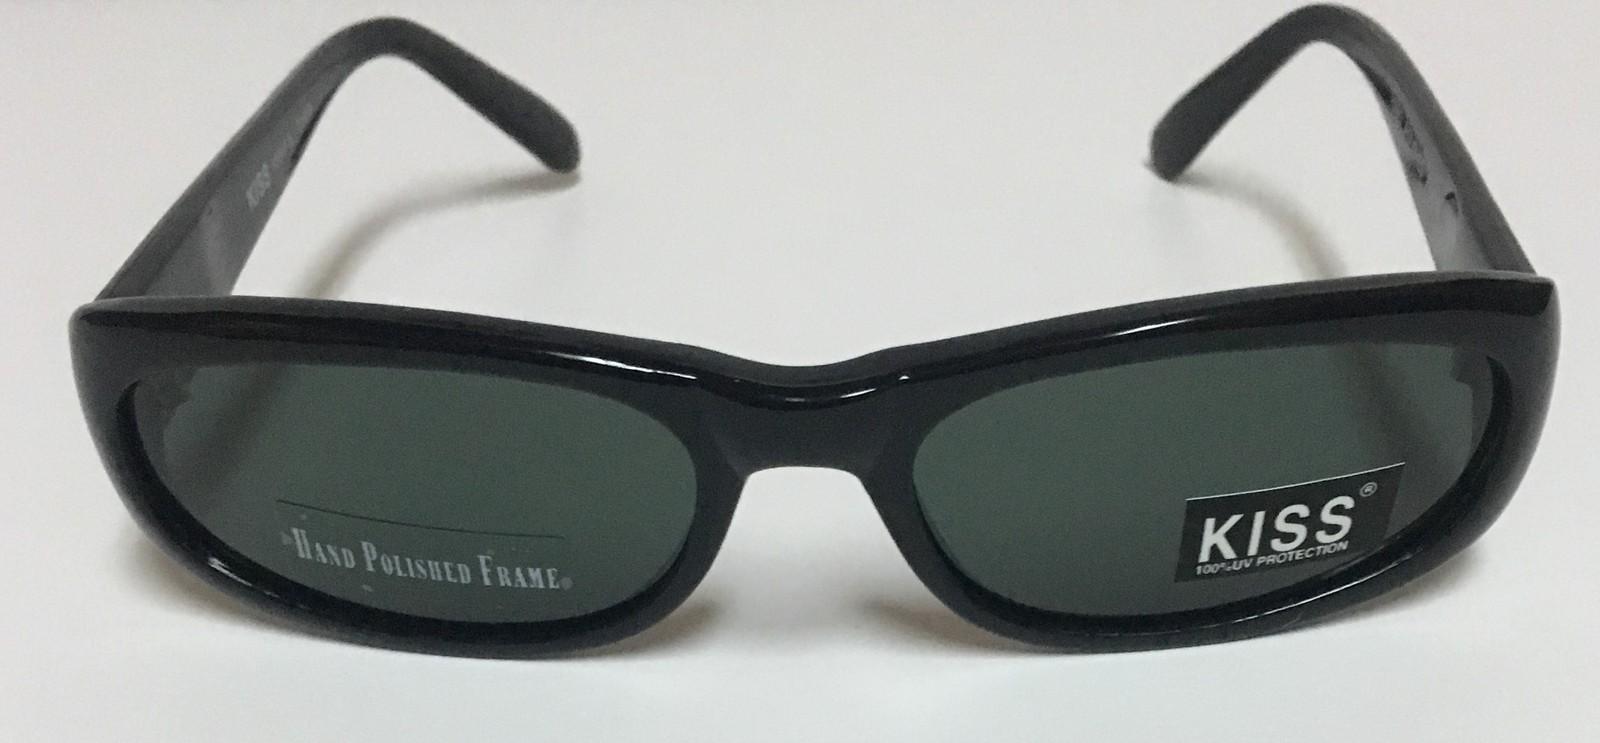 371254242d7 KISS Italy Designed Sunglasses 100% UV Protection Black Green Lens